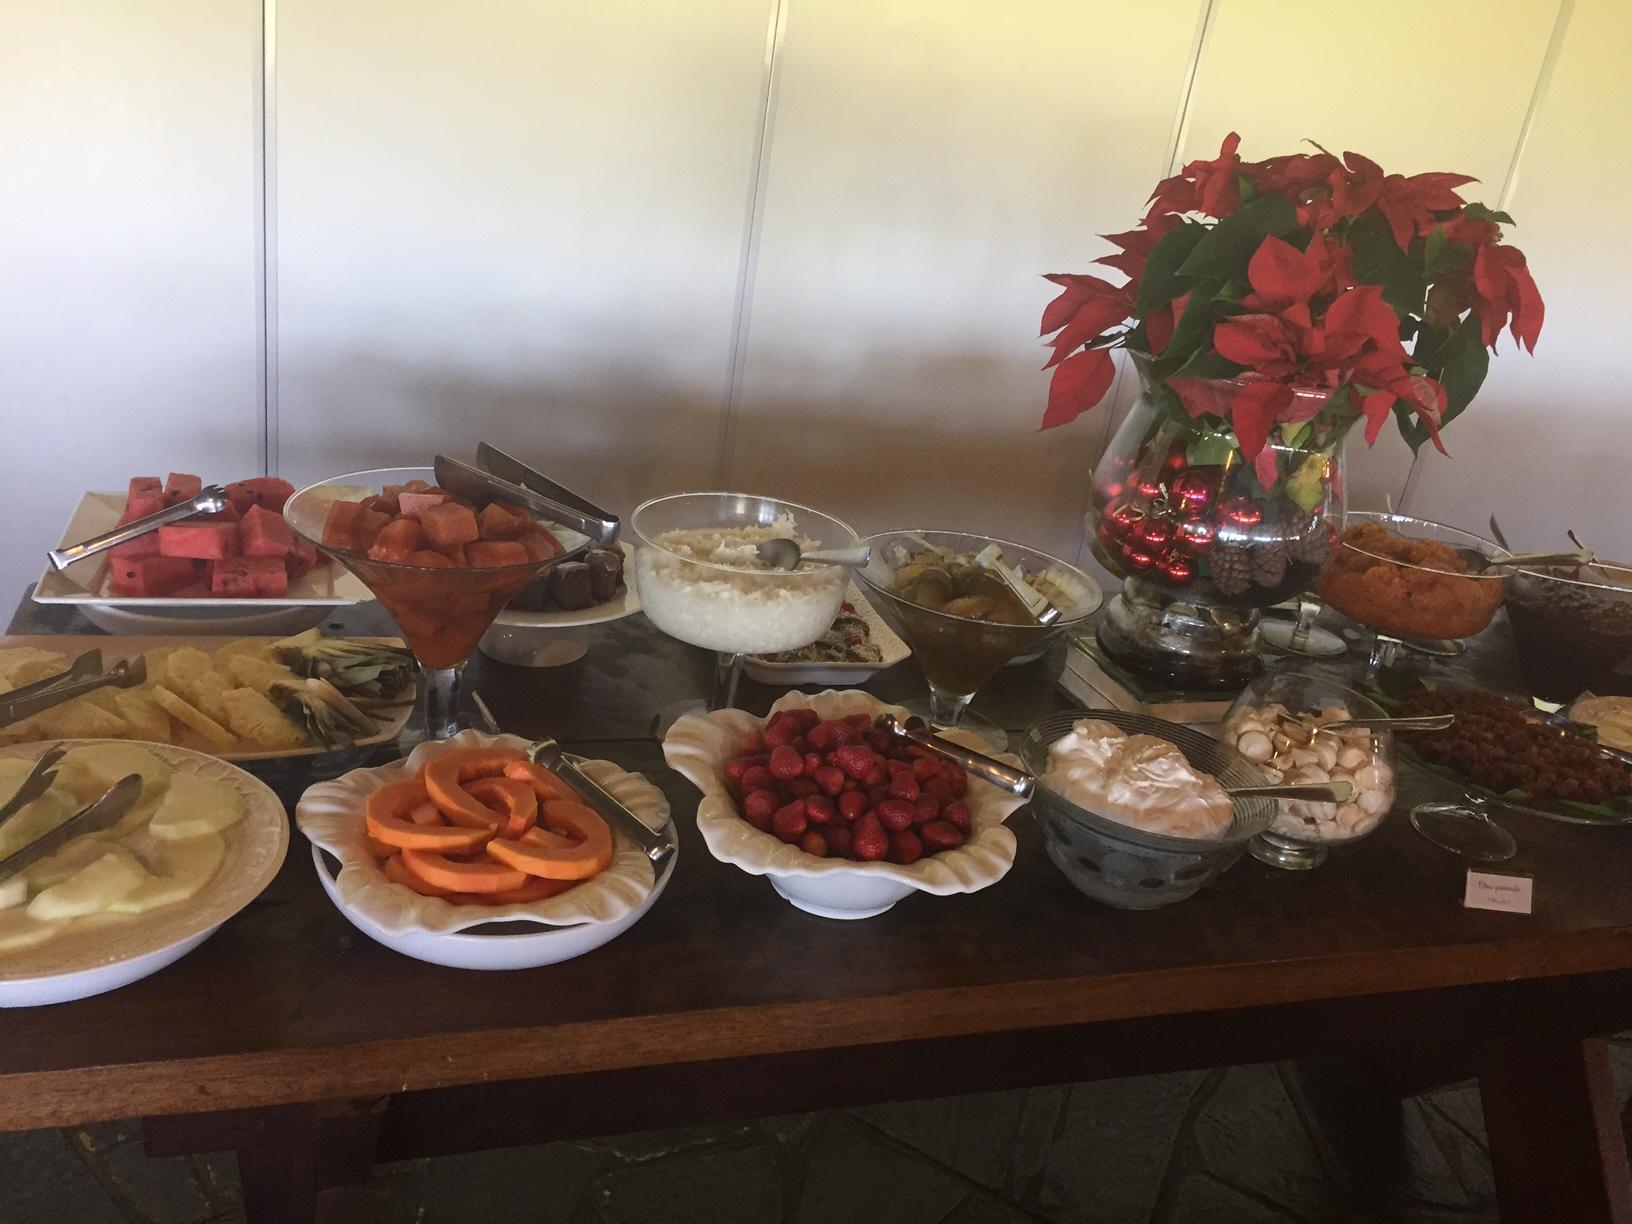 Muitas sobremesas e doces caseiros